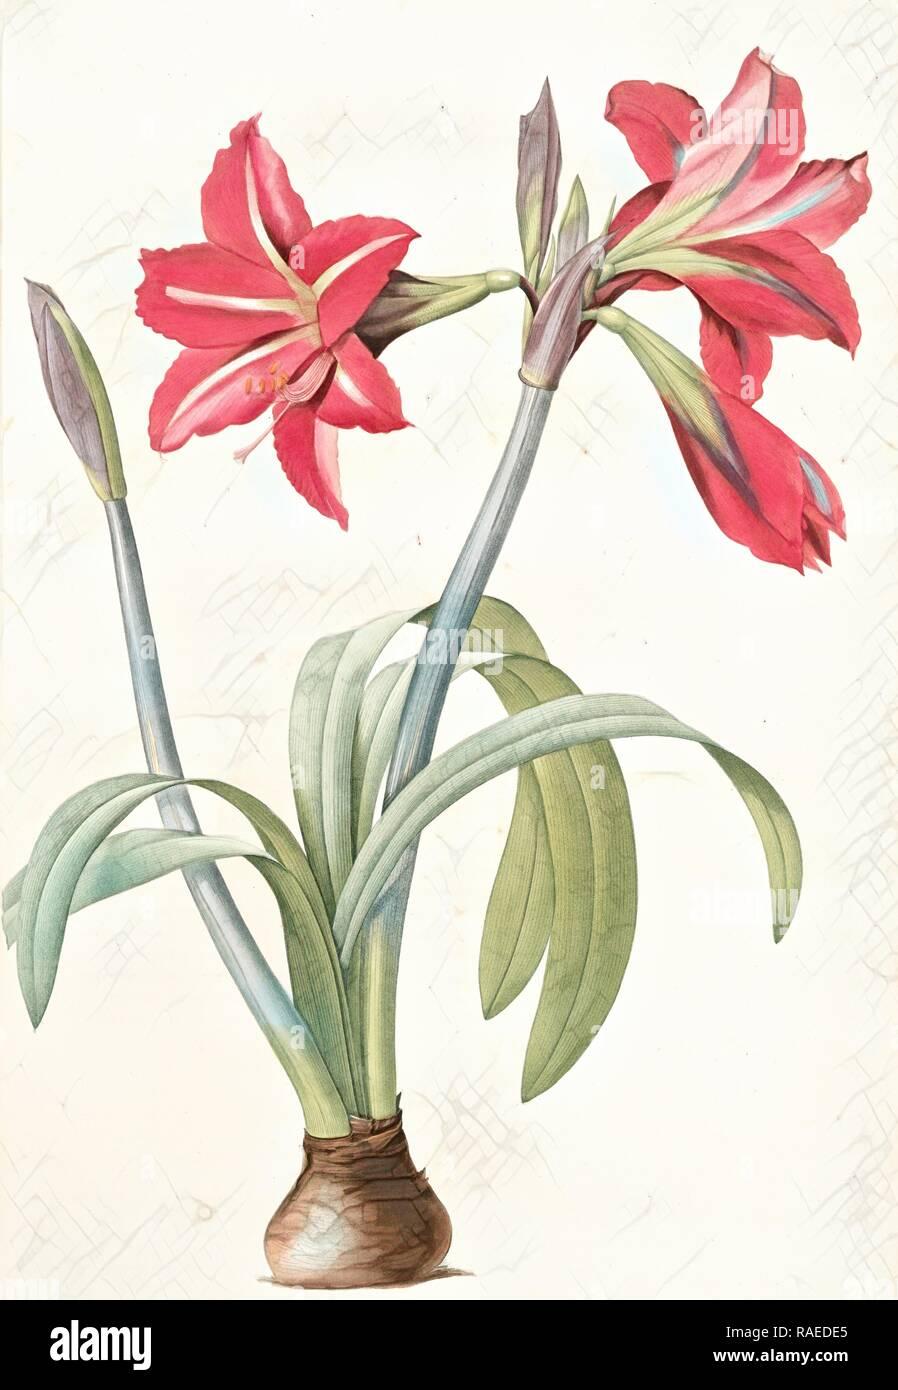 Amaryllis brasiliensis, Hippeastrum equestre, Amaryllis brèsilienne, Barbados Lily, Redouté, Pierre Joseph, 1759-1840 reimagined - Stock Image